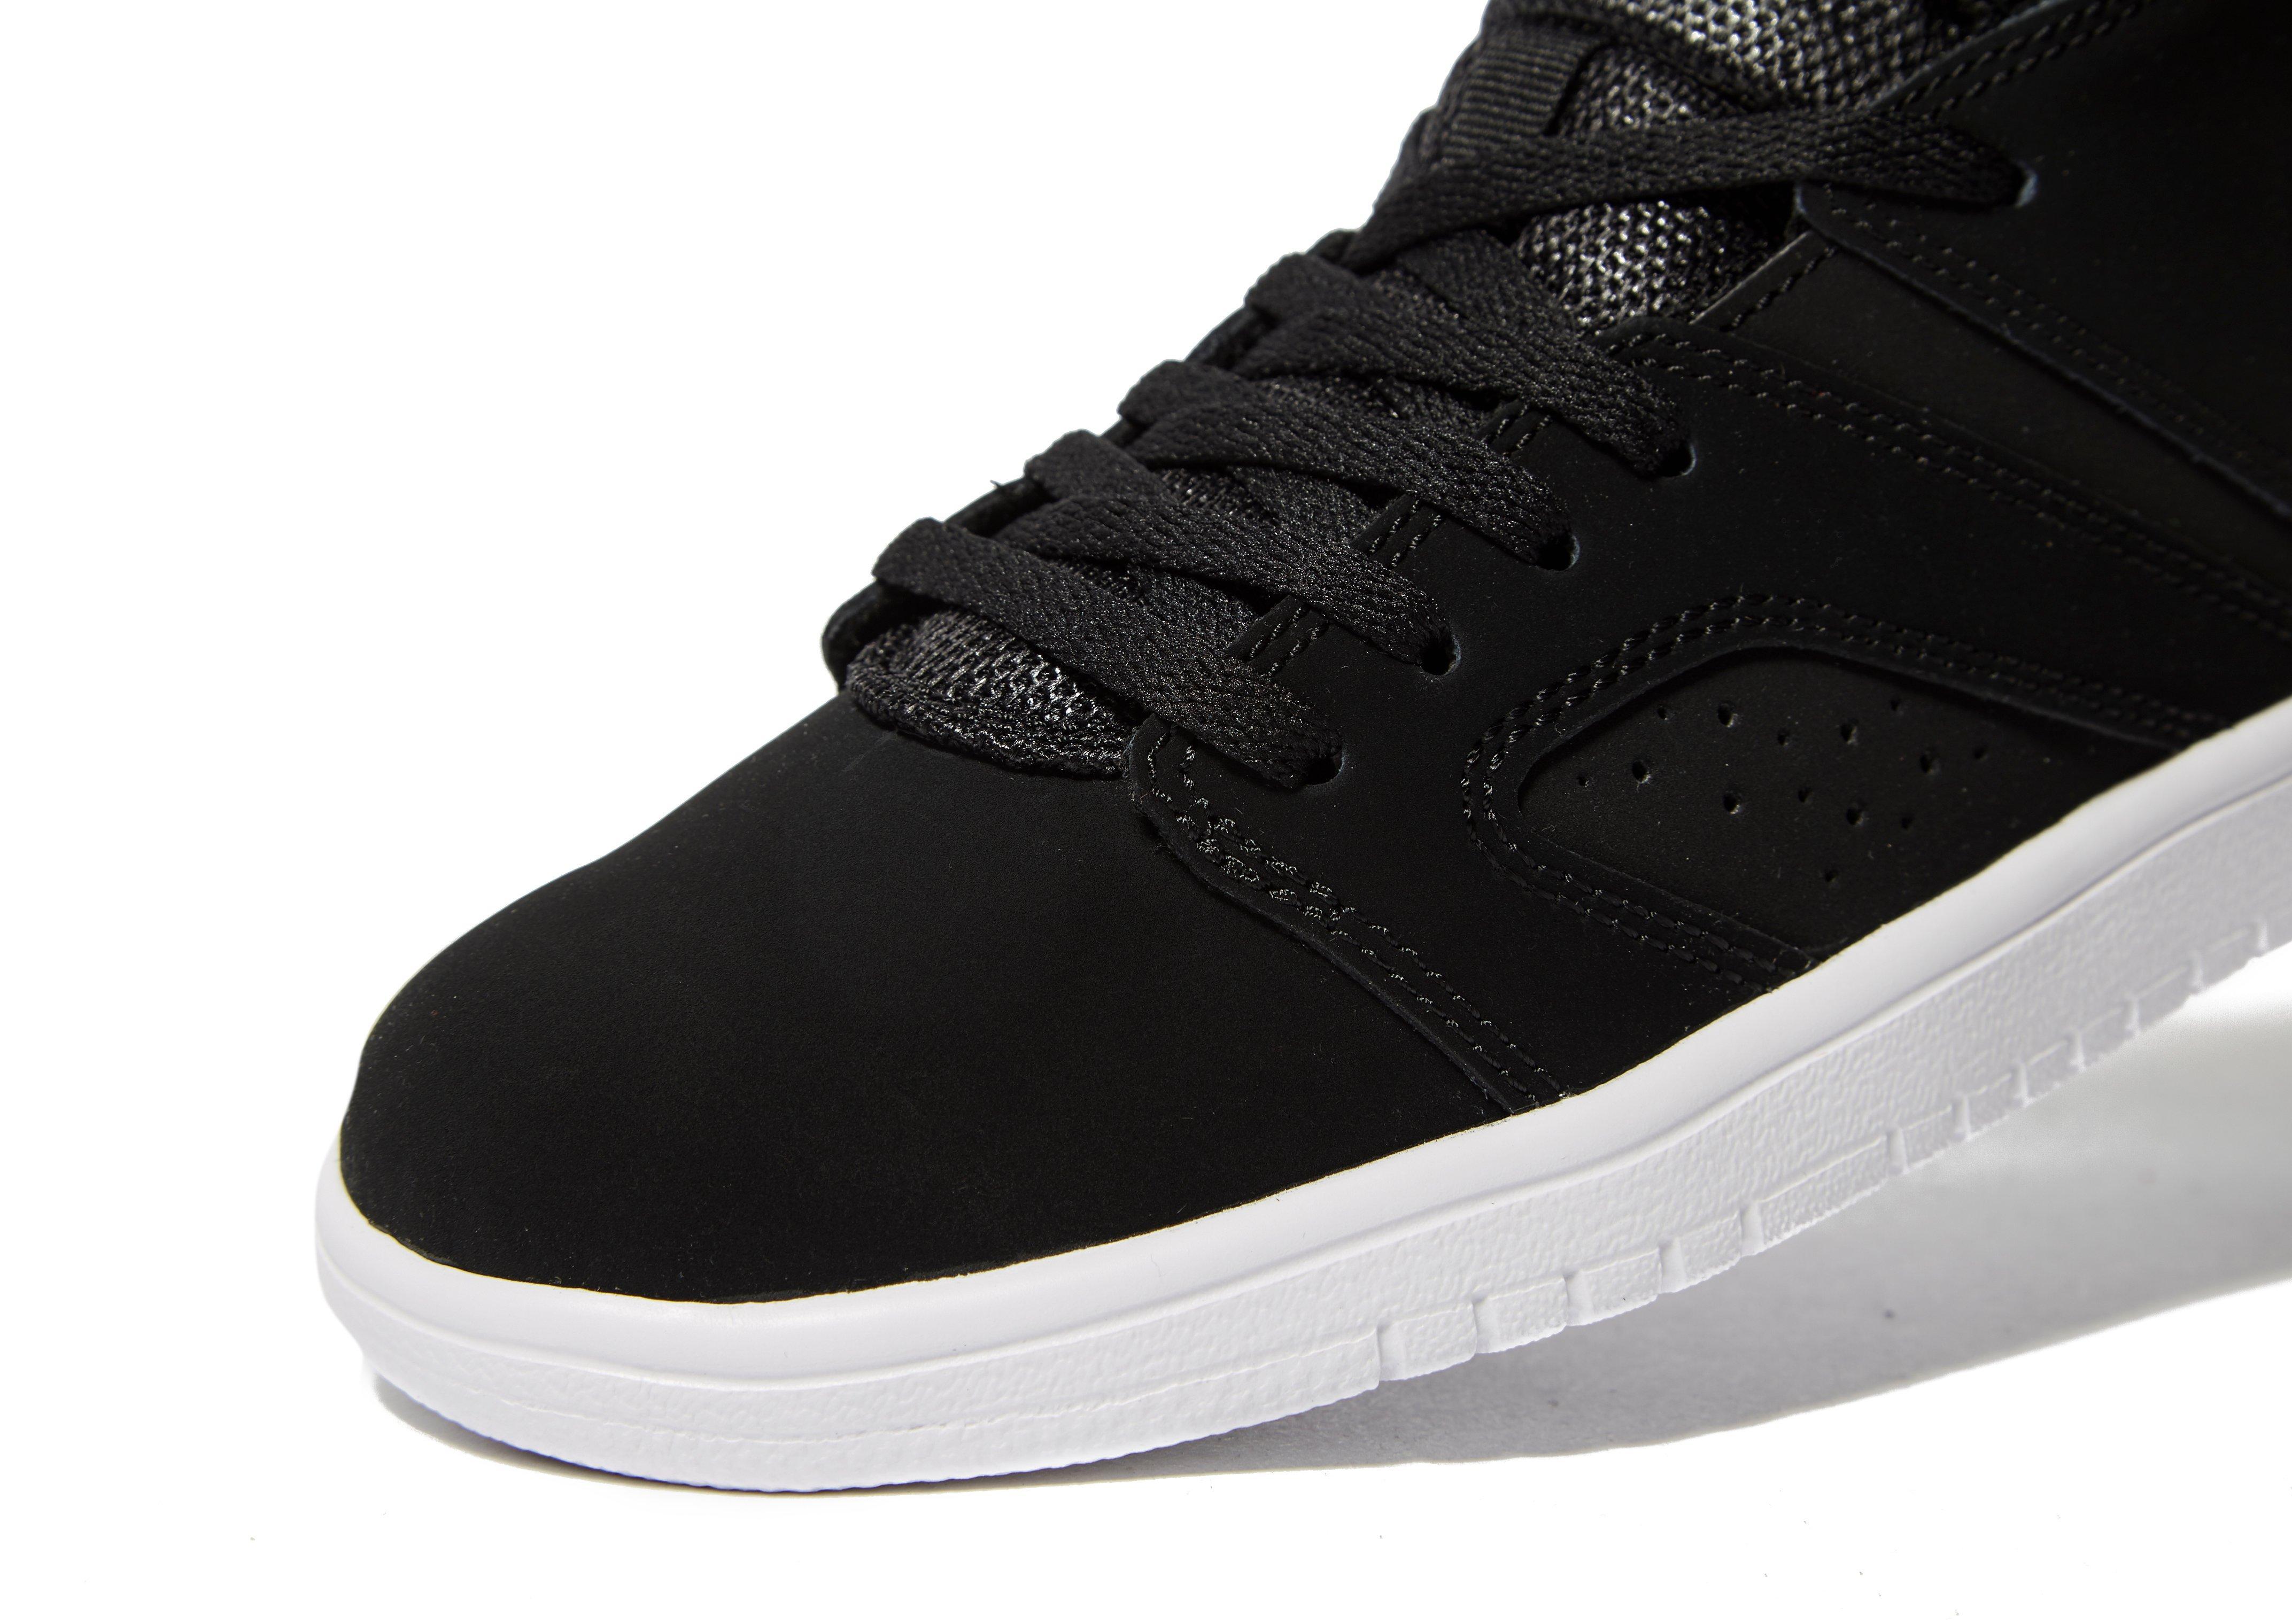 3b0f697e0ce Nike Tiempo Legacy Ii Fg Review Custom Made Shoes For Women. tiempo legacy  iii fg